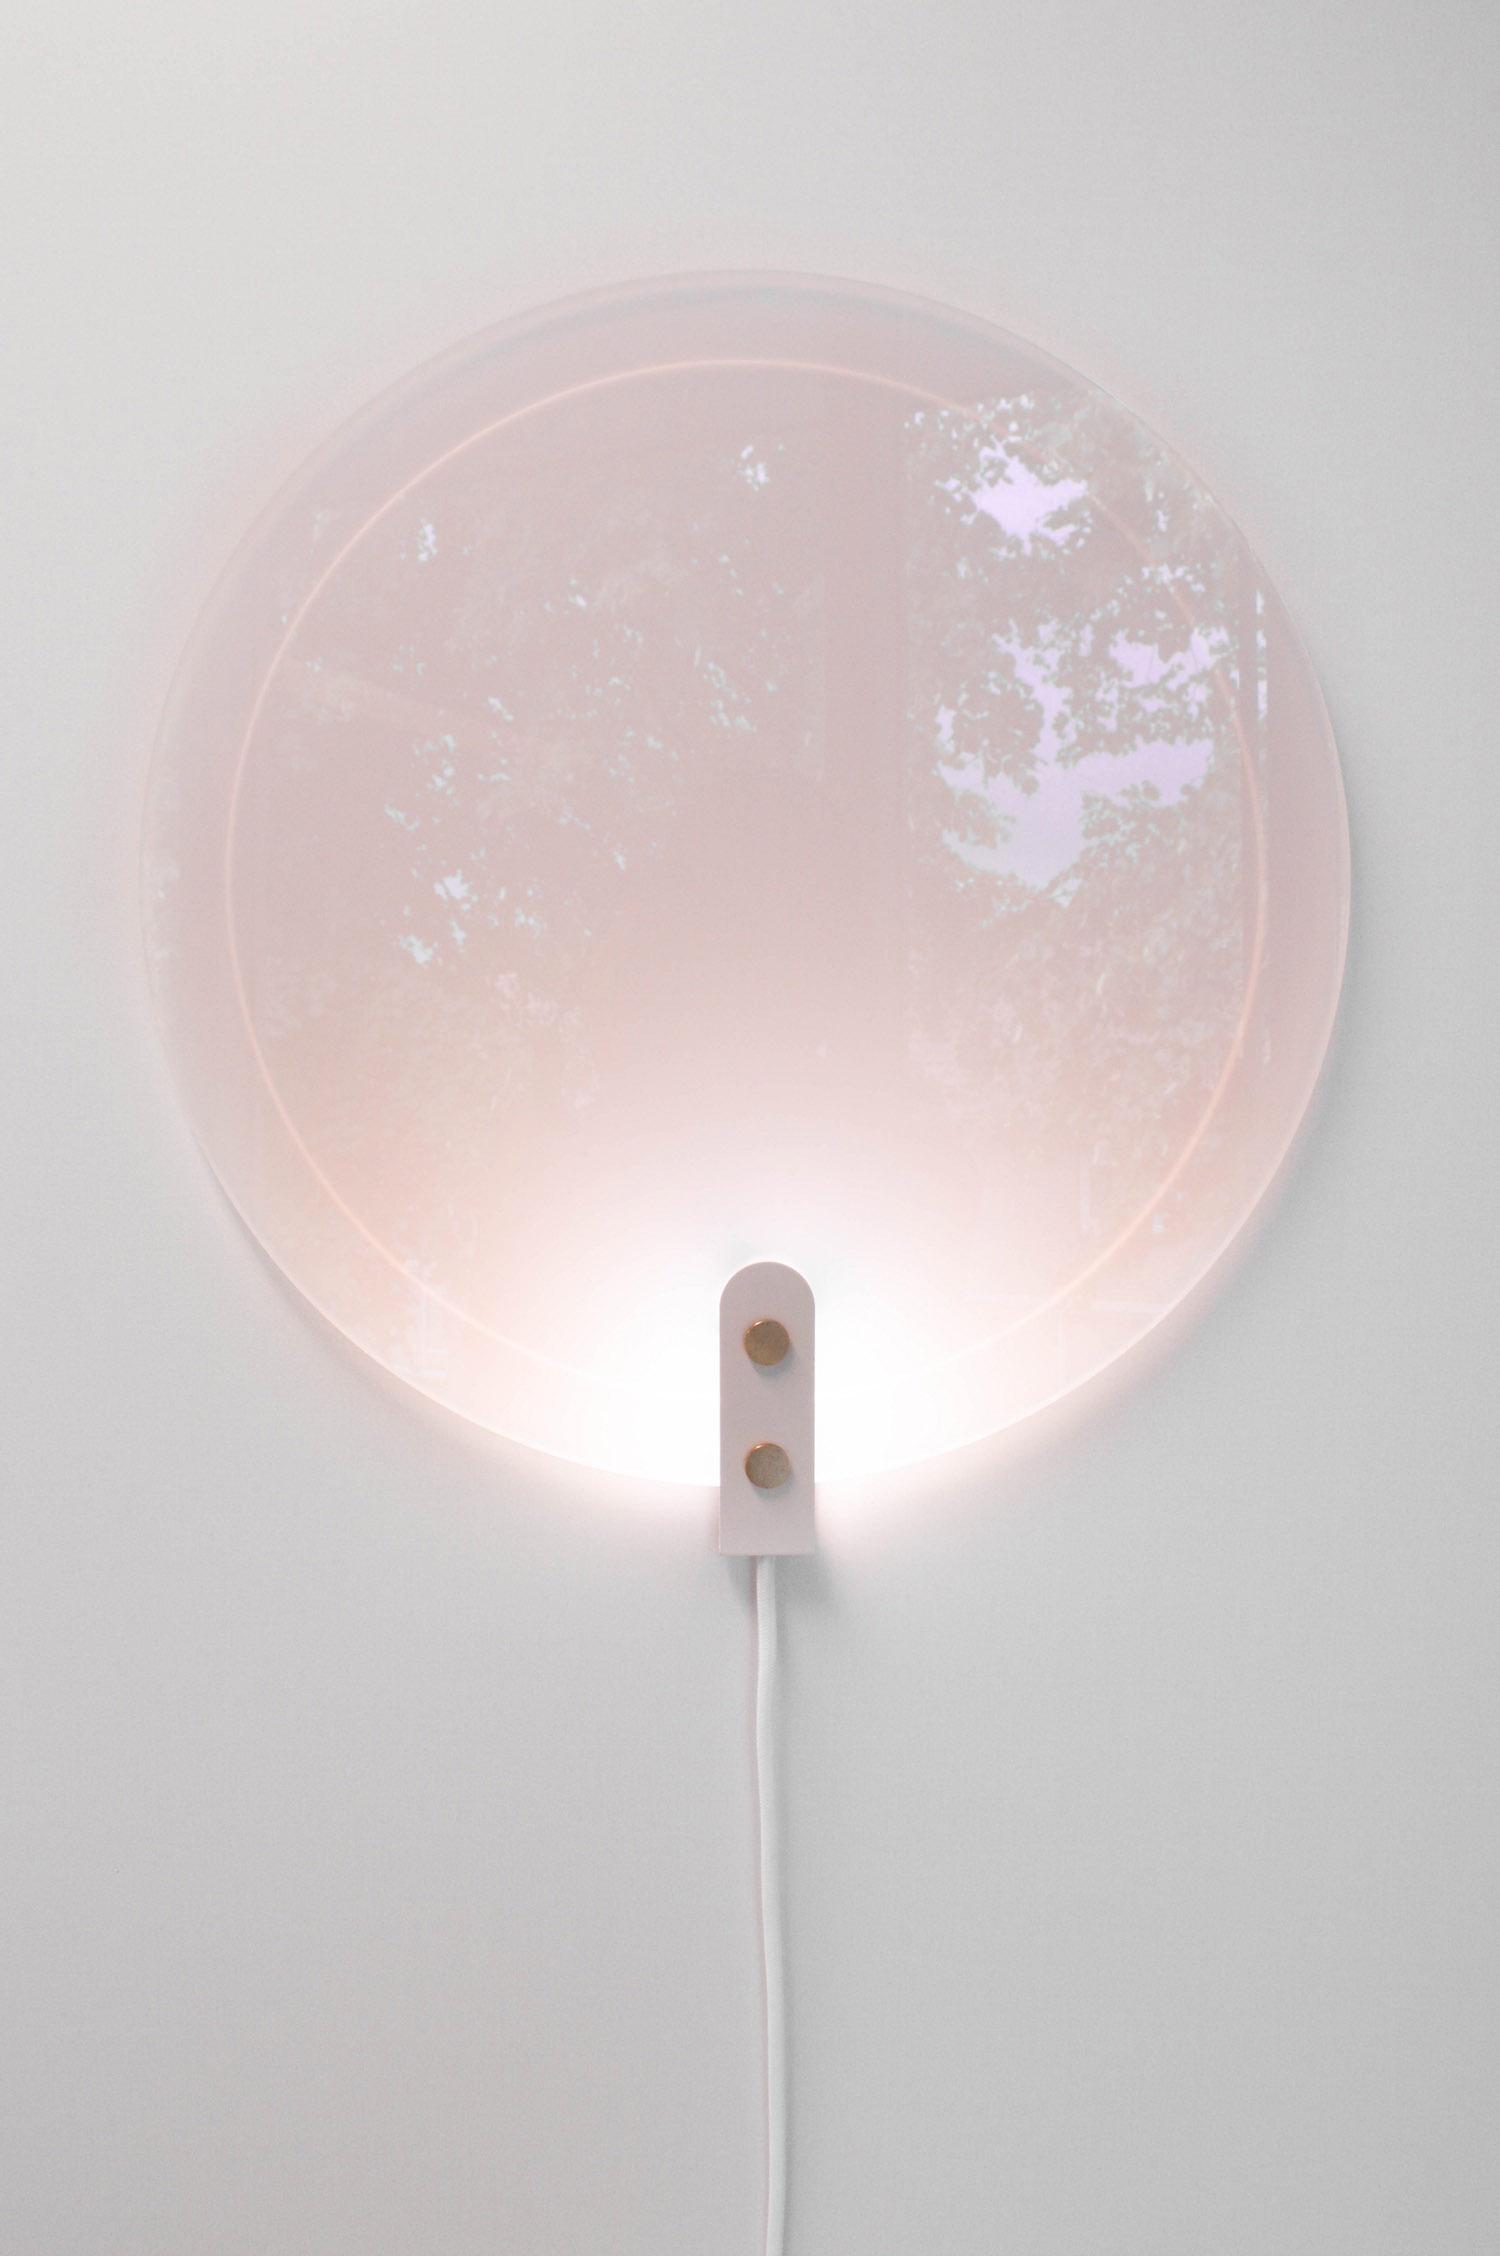 iGNANT_Design_Studio_Fabian_Zeijler Designs_Lamps_Sun_Gazing_06